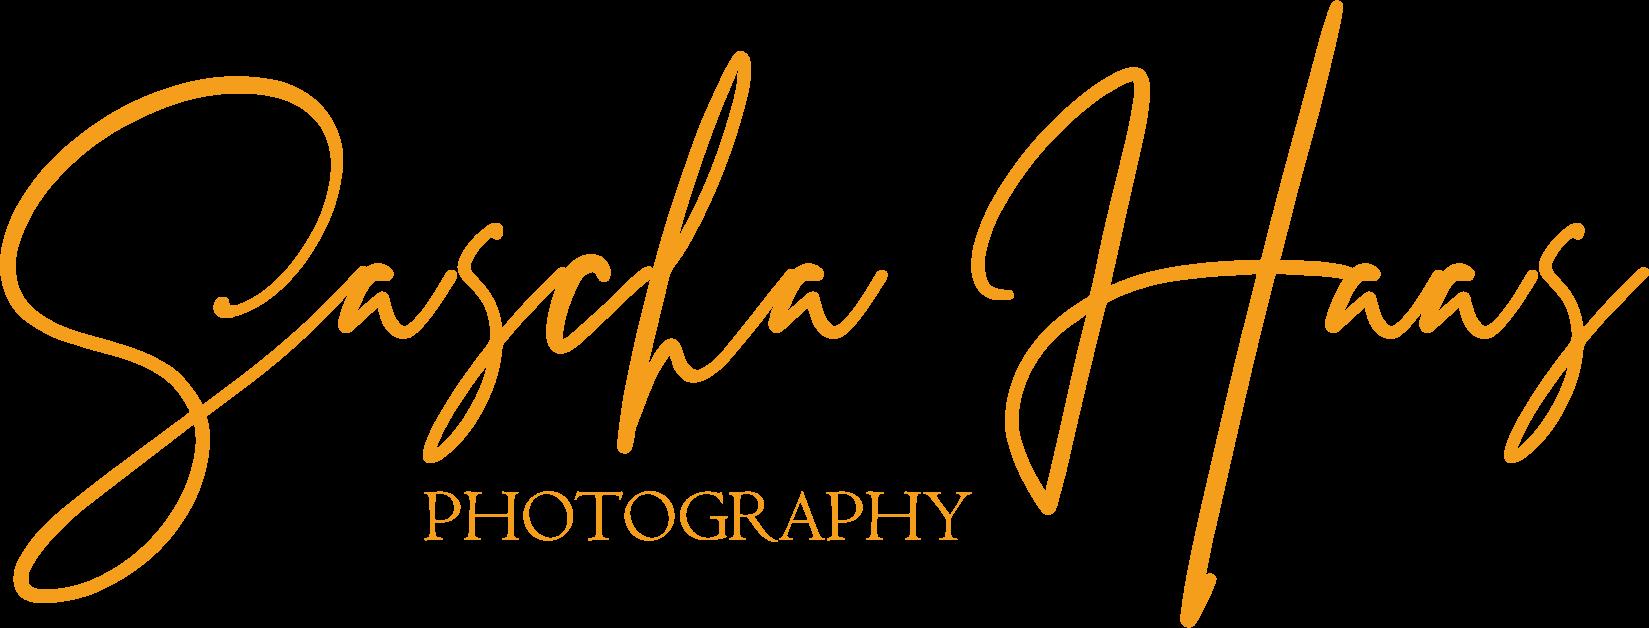 saschahaas-photography